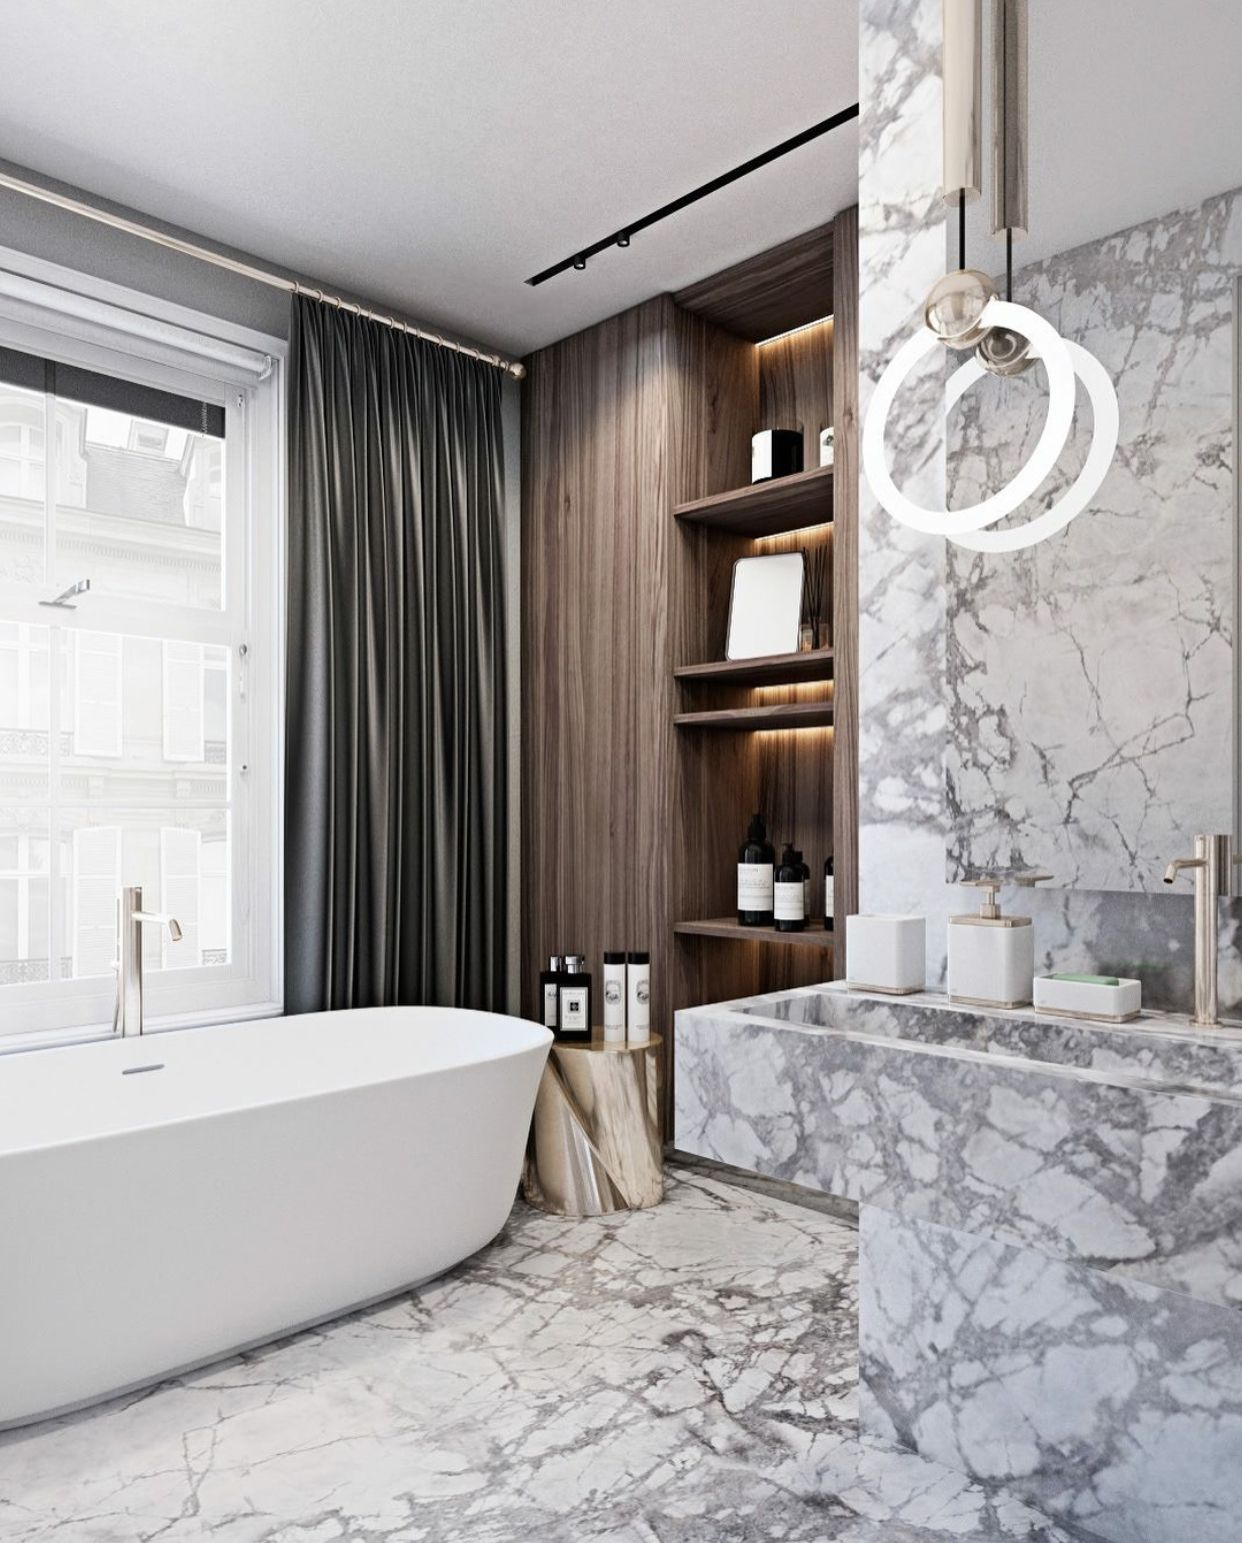 Contemporary Luxury Bath Avec Images Idee Salle De Bain Idee